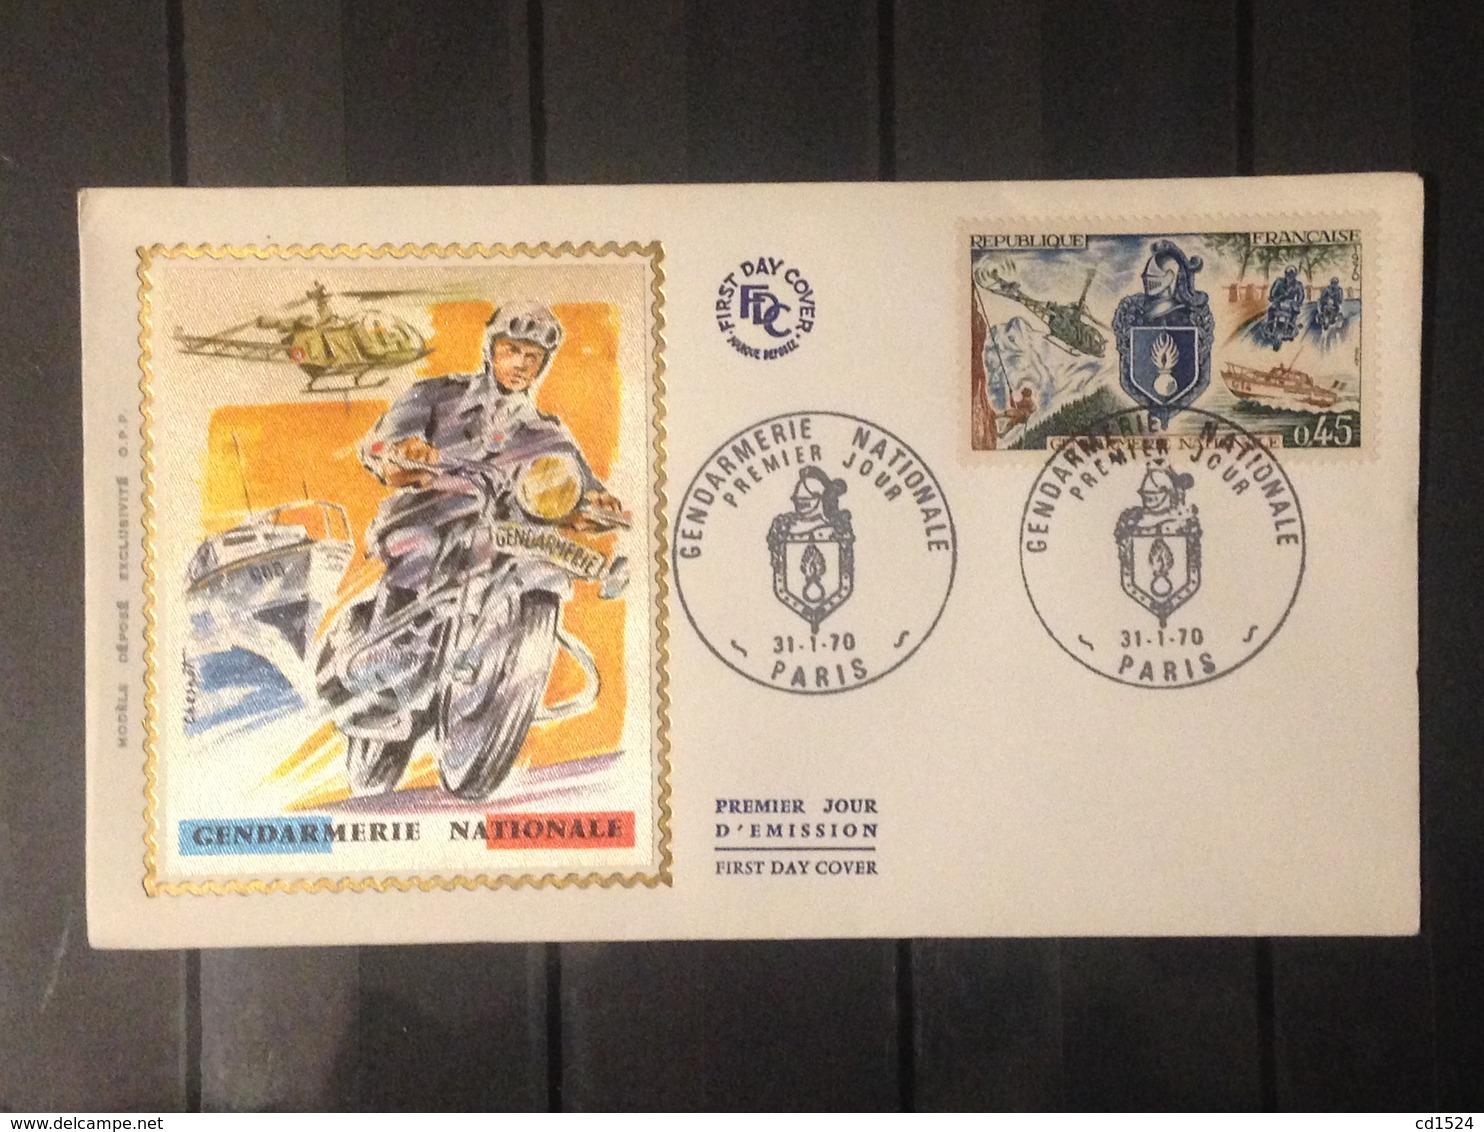 France - 1970 - Enveloppe 1er Jour - Gendarmerie Nationale - France